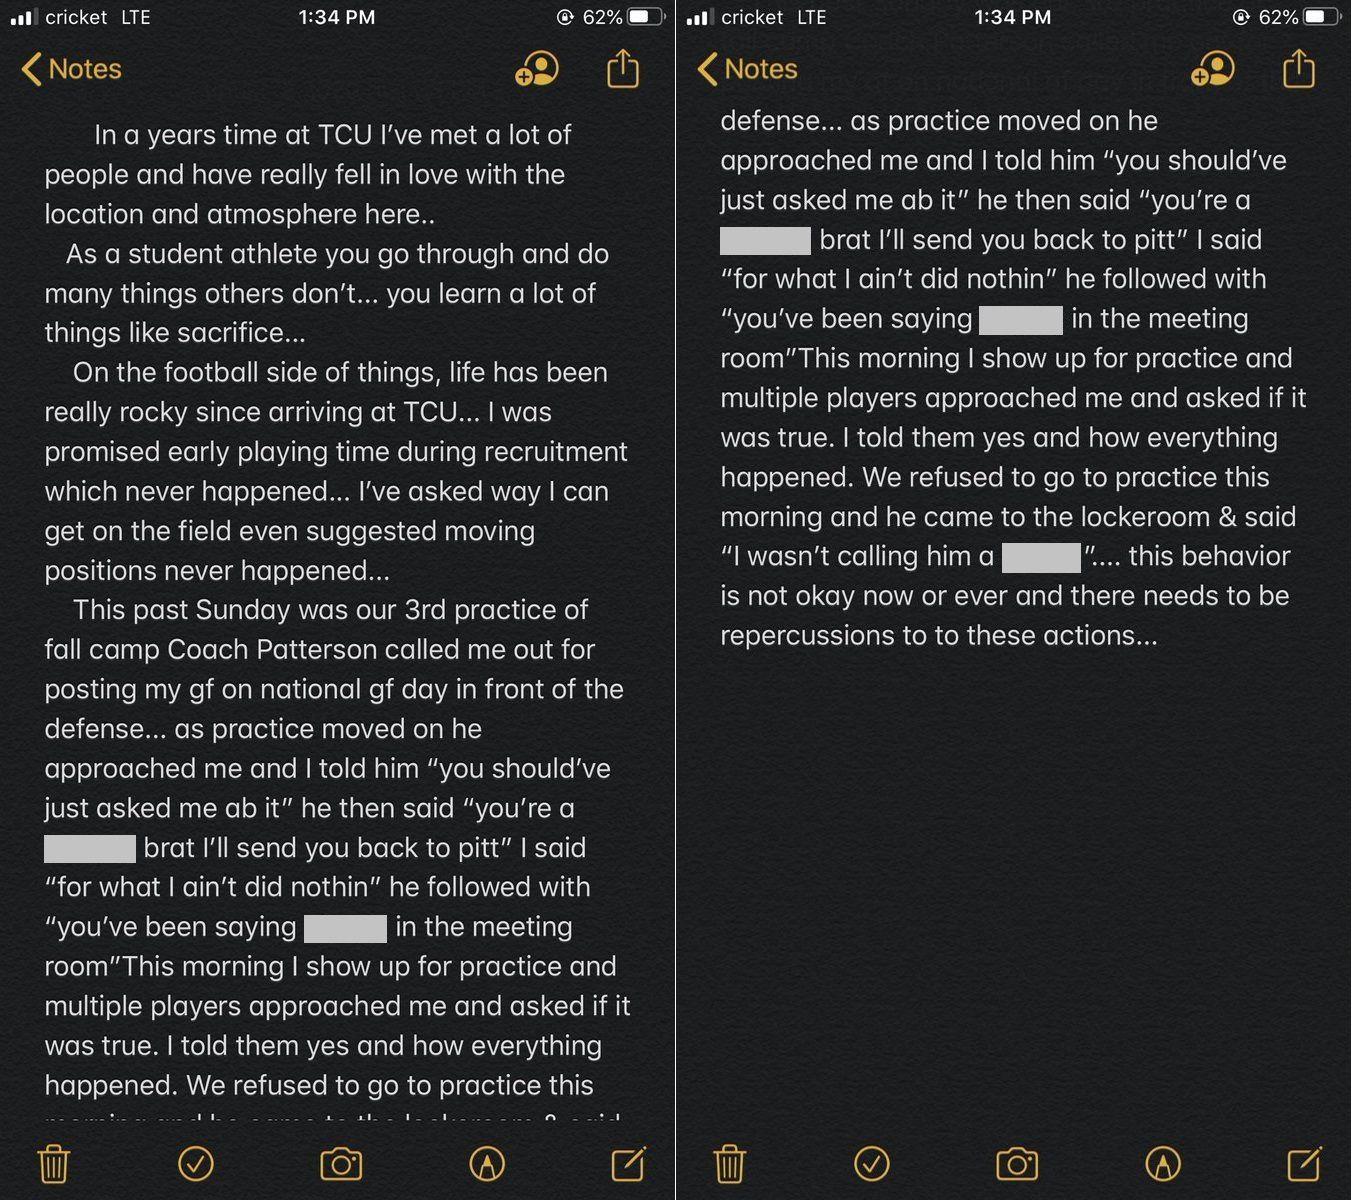 Screen shots from TCU linebacker Dylan Jordan's Twitter account (@thedylanjordan_)